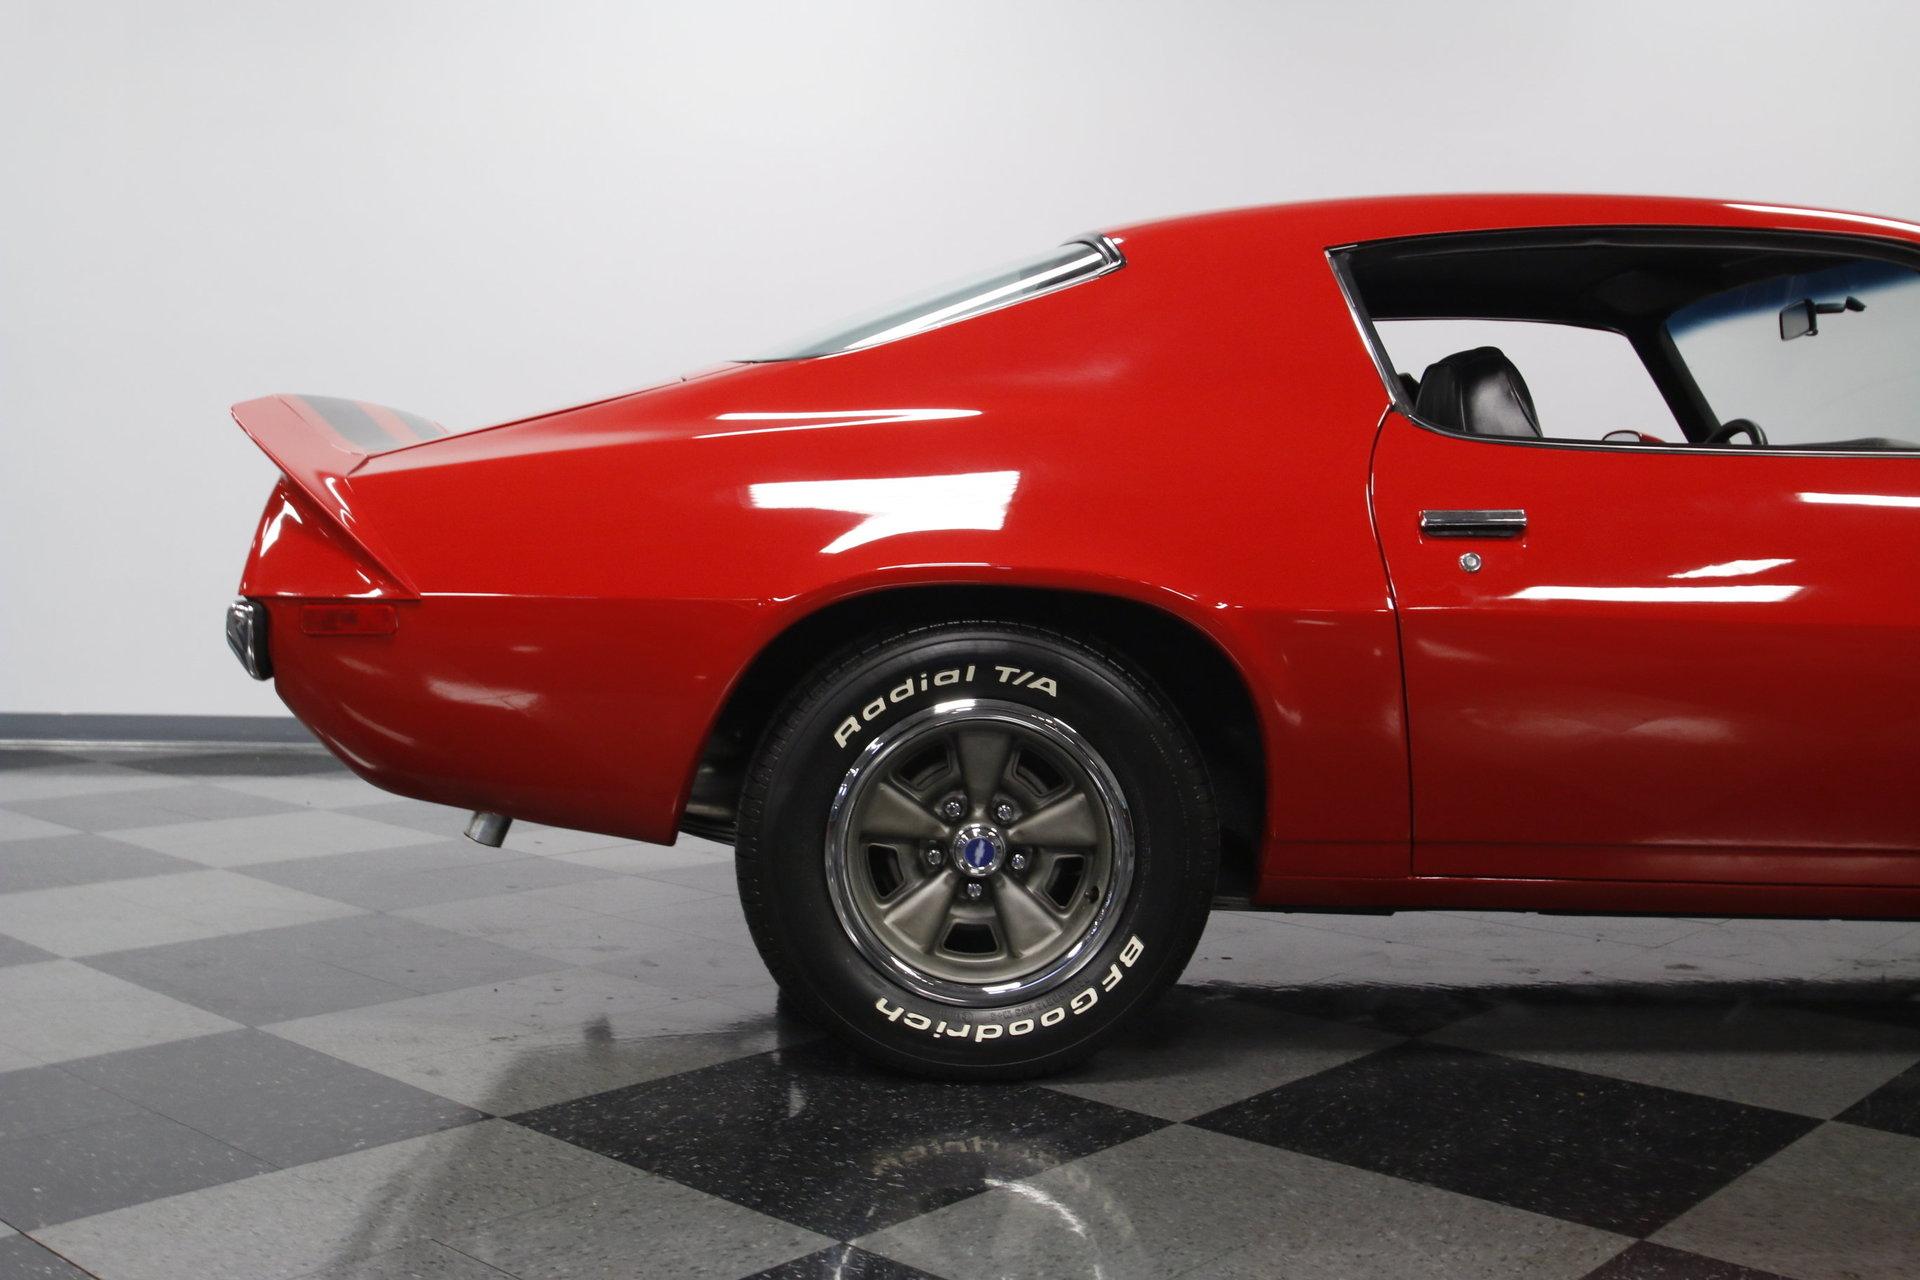 Great American Chevrolet Muncie U003eu003e 1971 Chevrolet Camaro Z/28 For Sale #73355 |